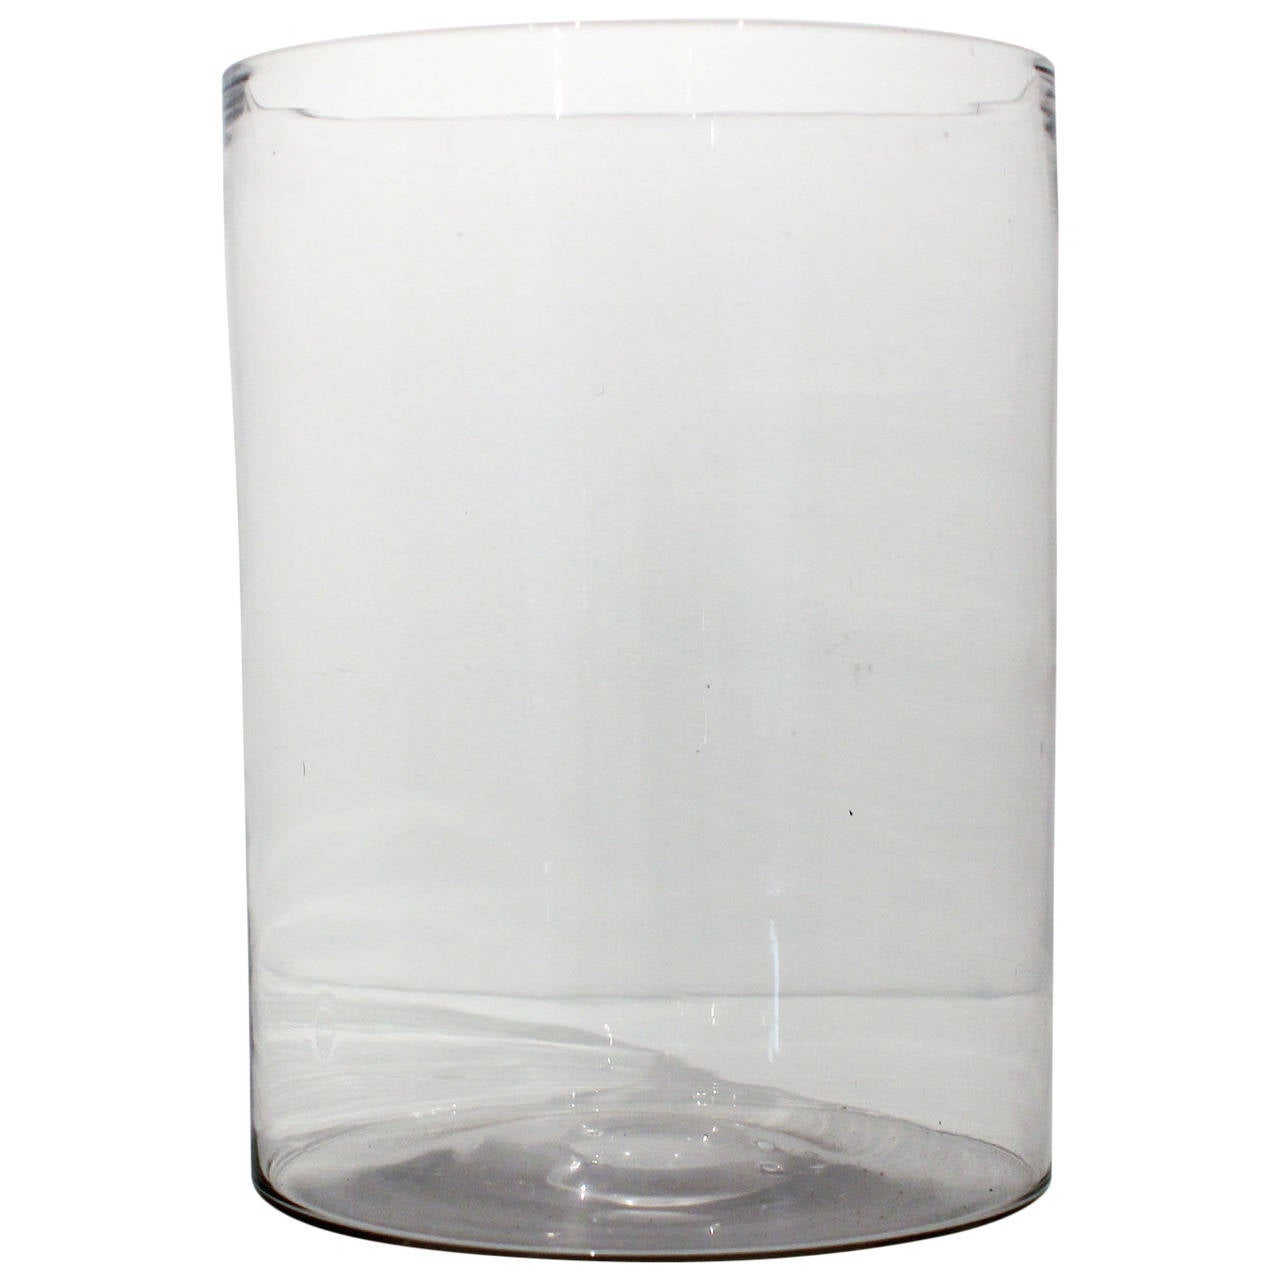 Large Glass Vessel : Home > Furniture > Serveware, Ceramics, Silver and Glass > Glass